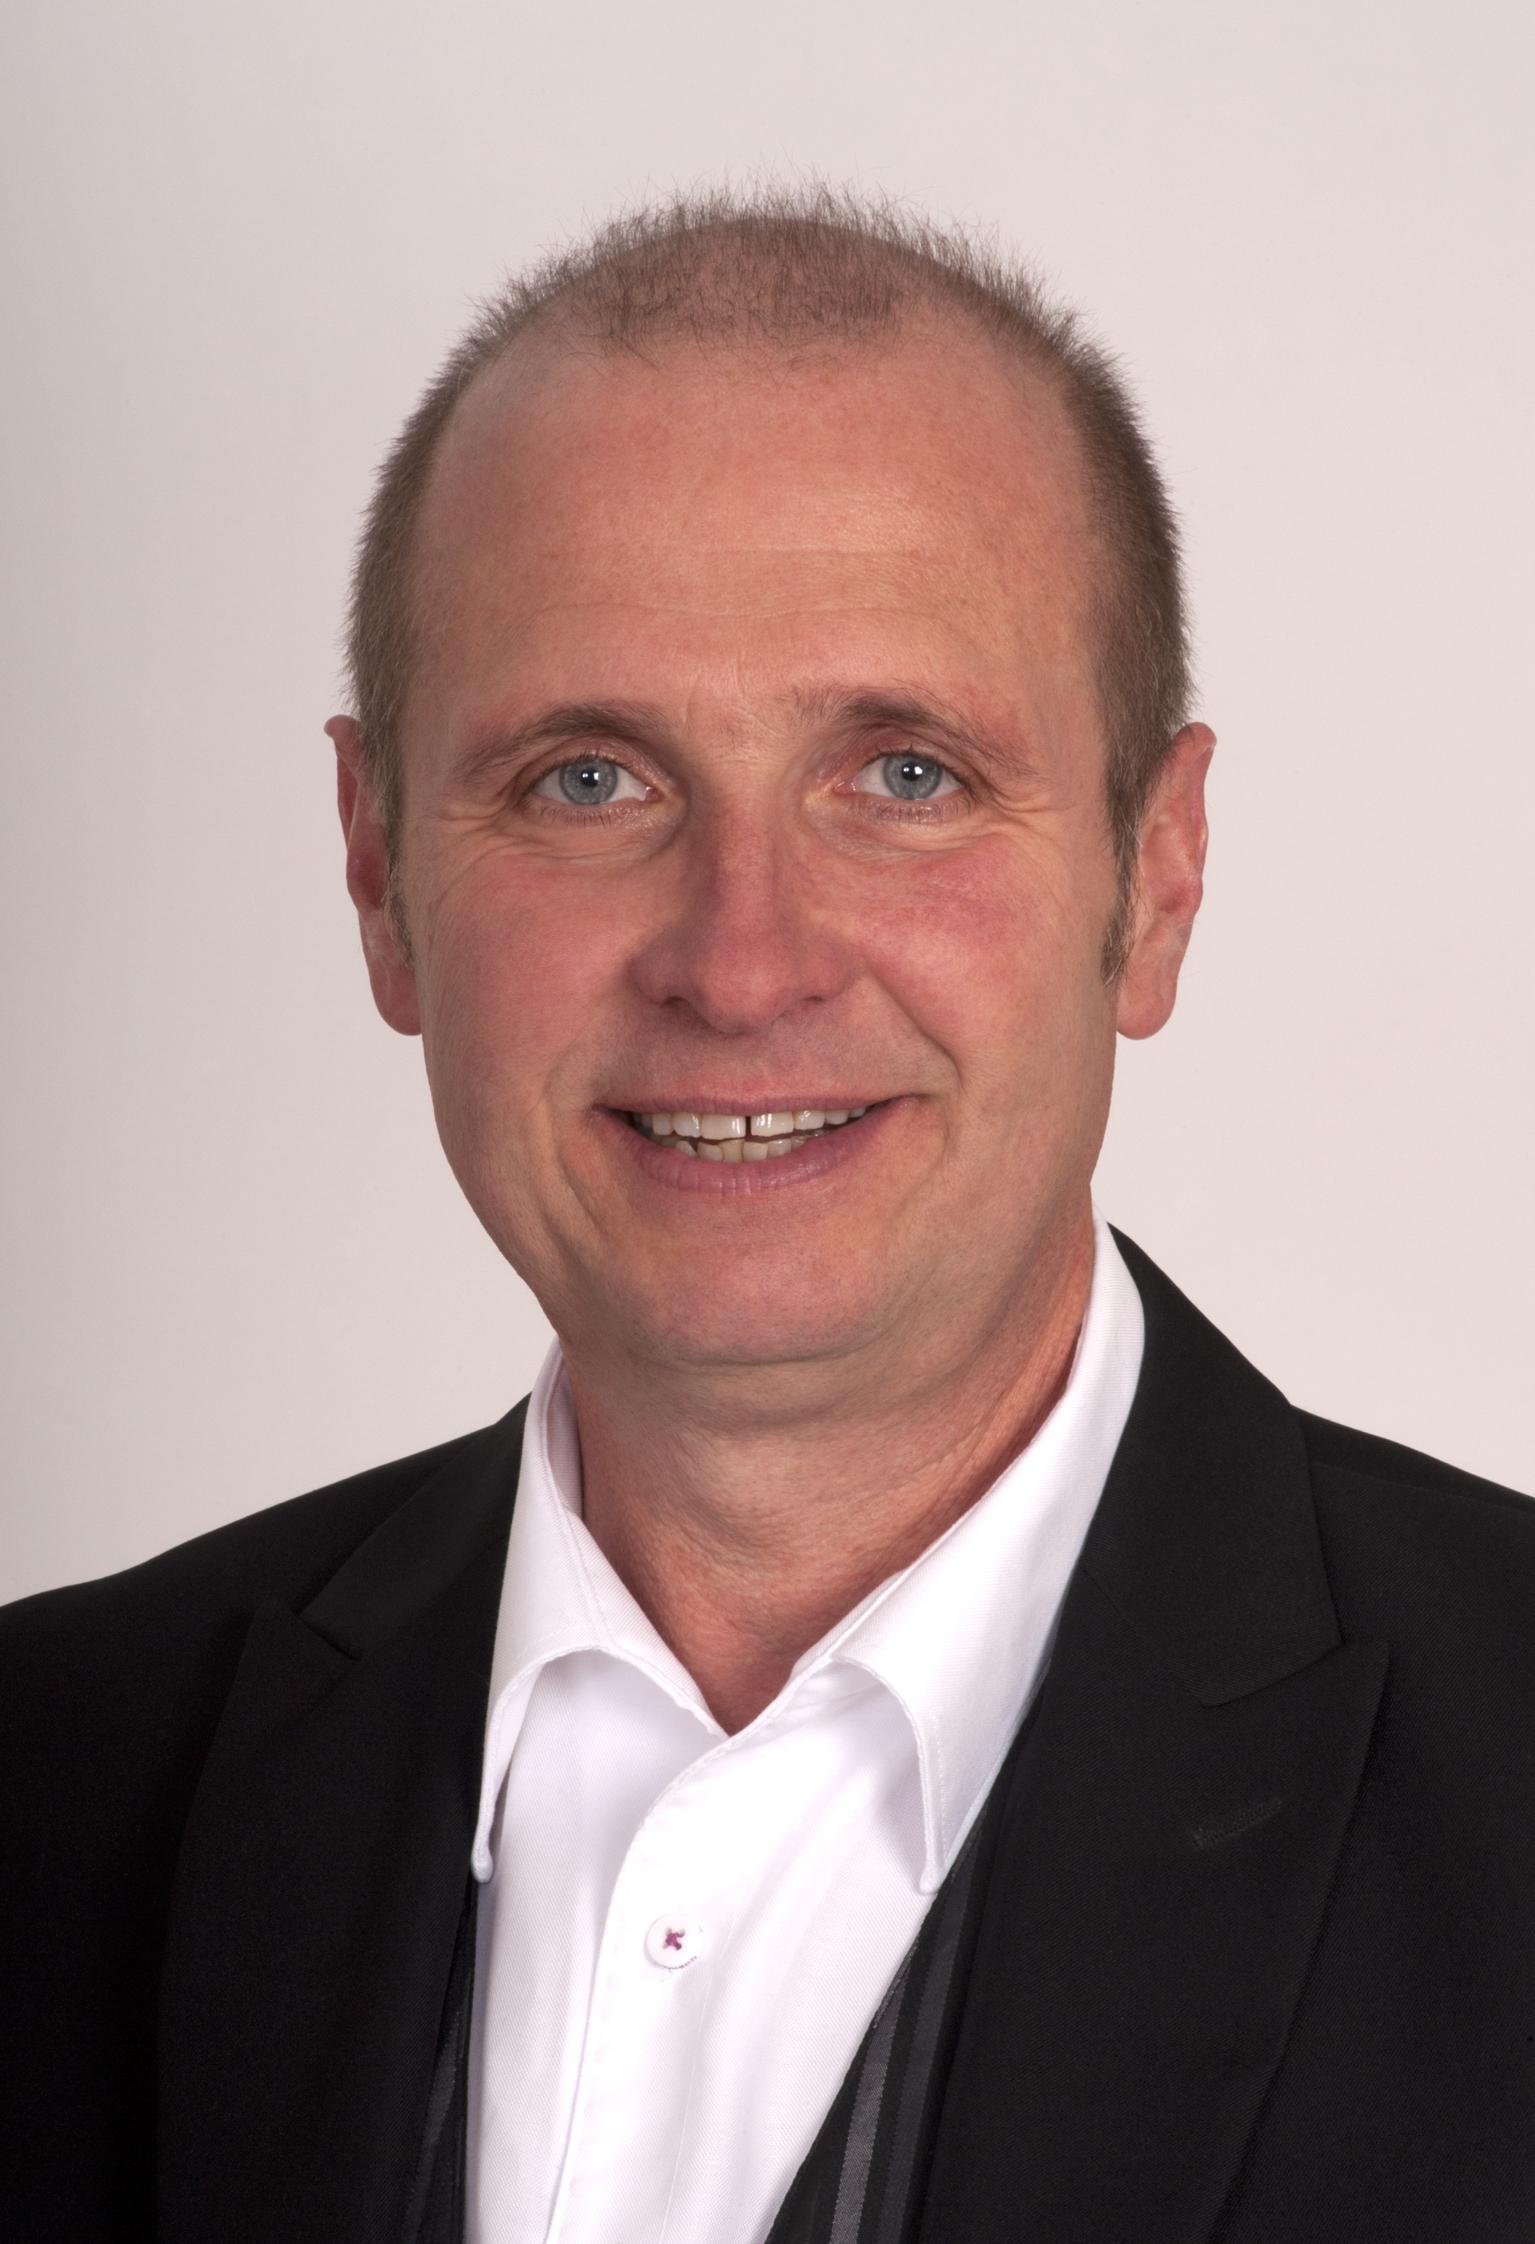 Heinz Klammer / Institut Besser Leben